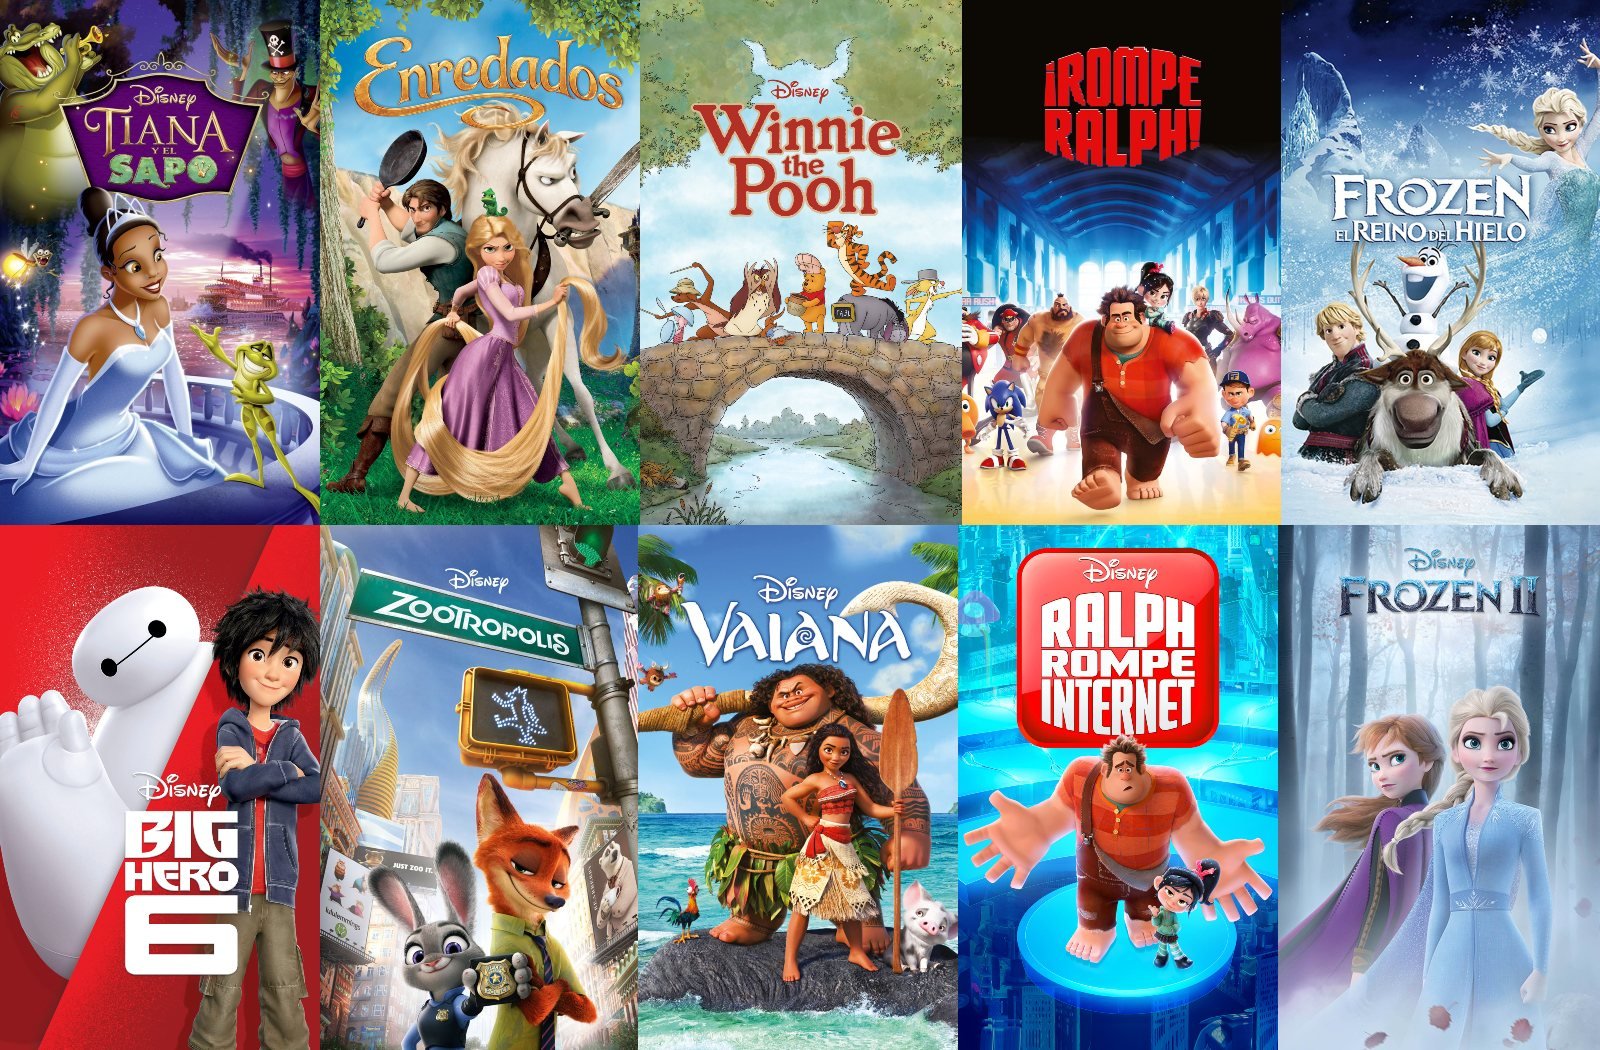 Revival Disney (2009 - 2019)